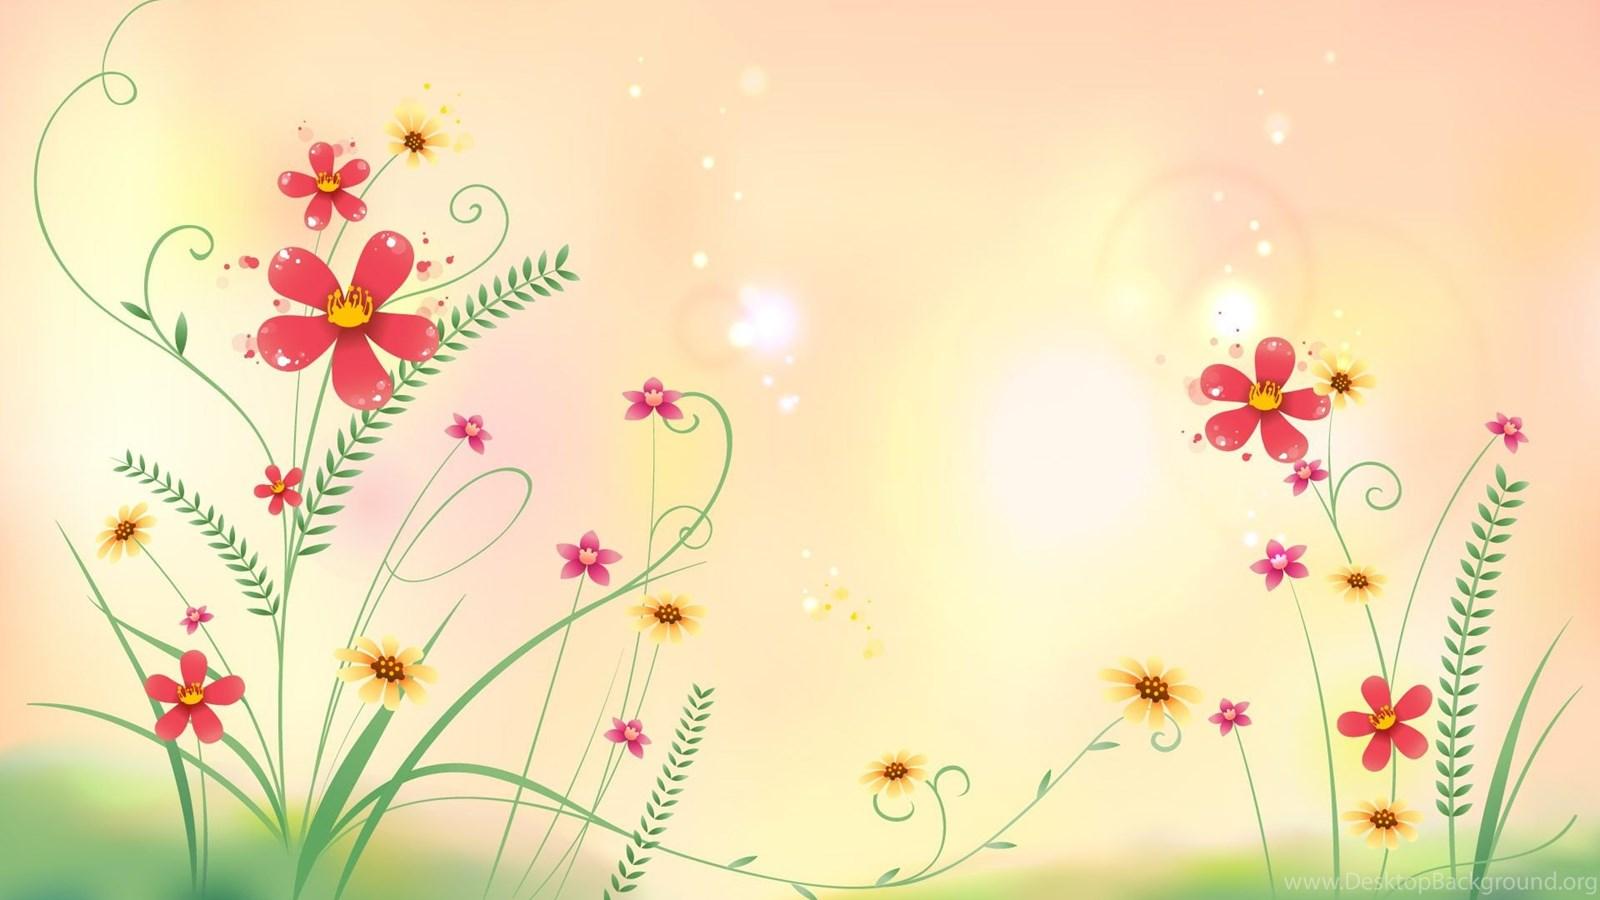 Top Abstract Floral C4d Wallpaper Images For Pinterest Desktop